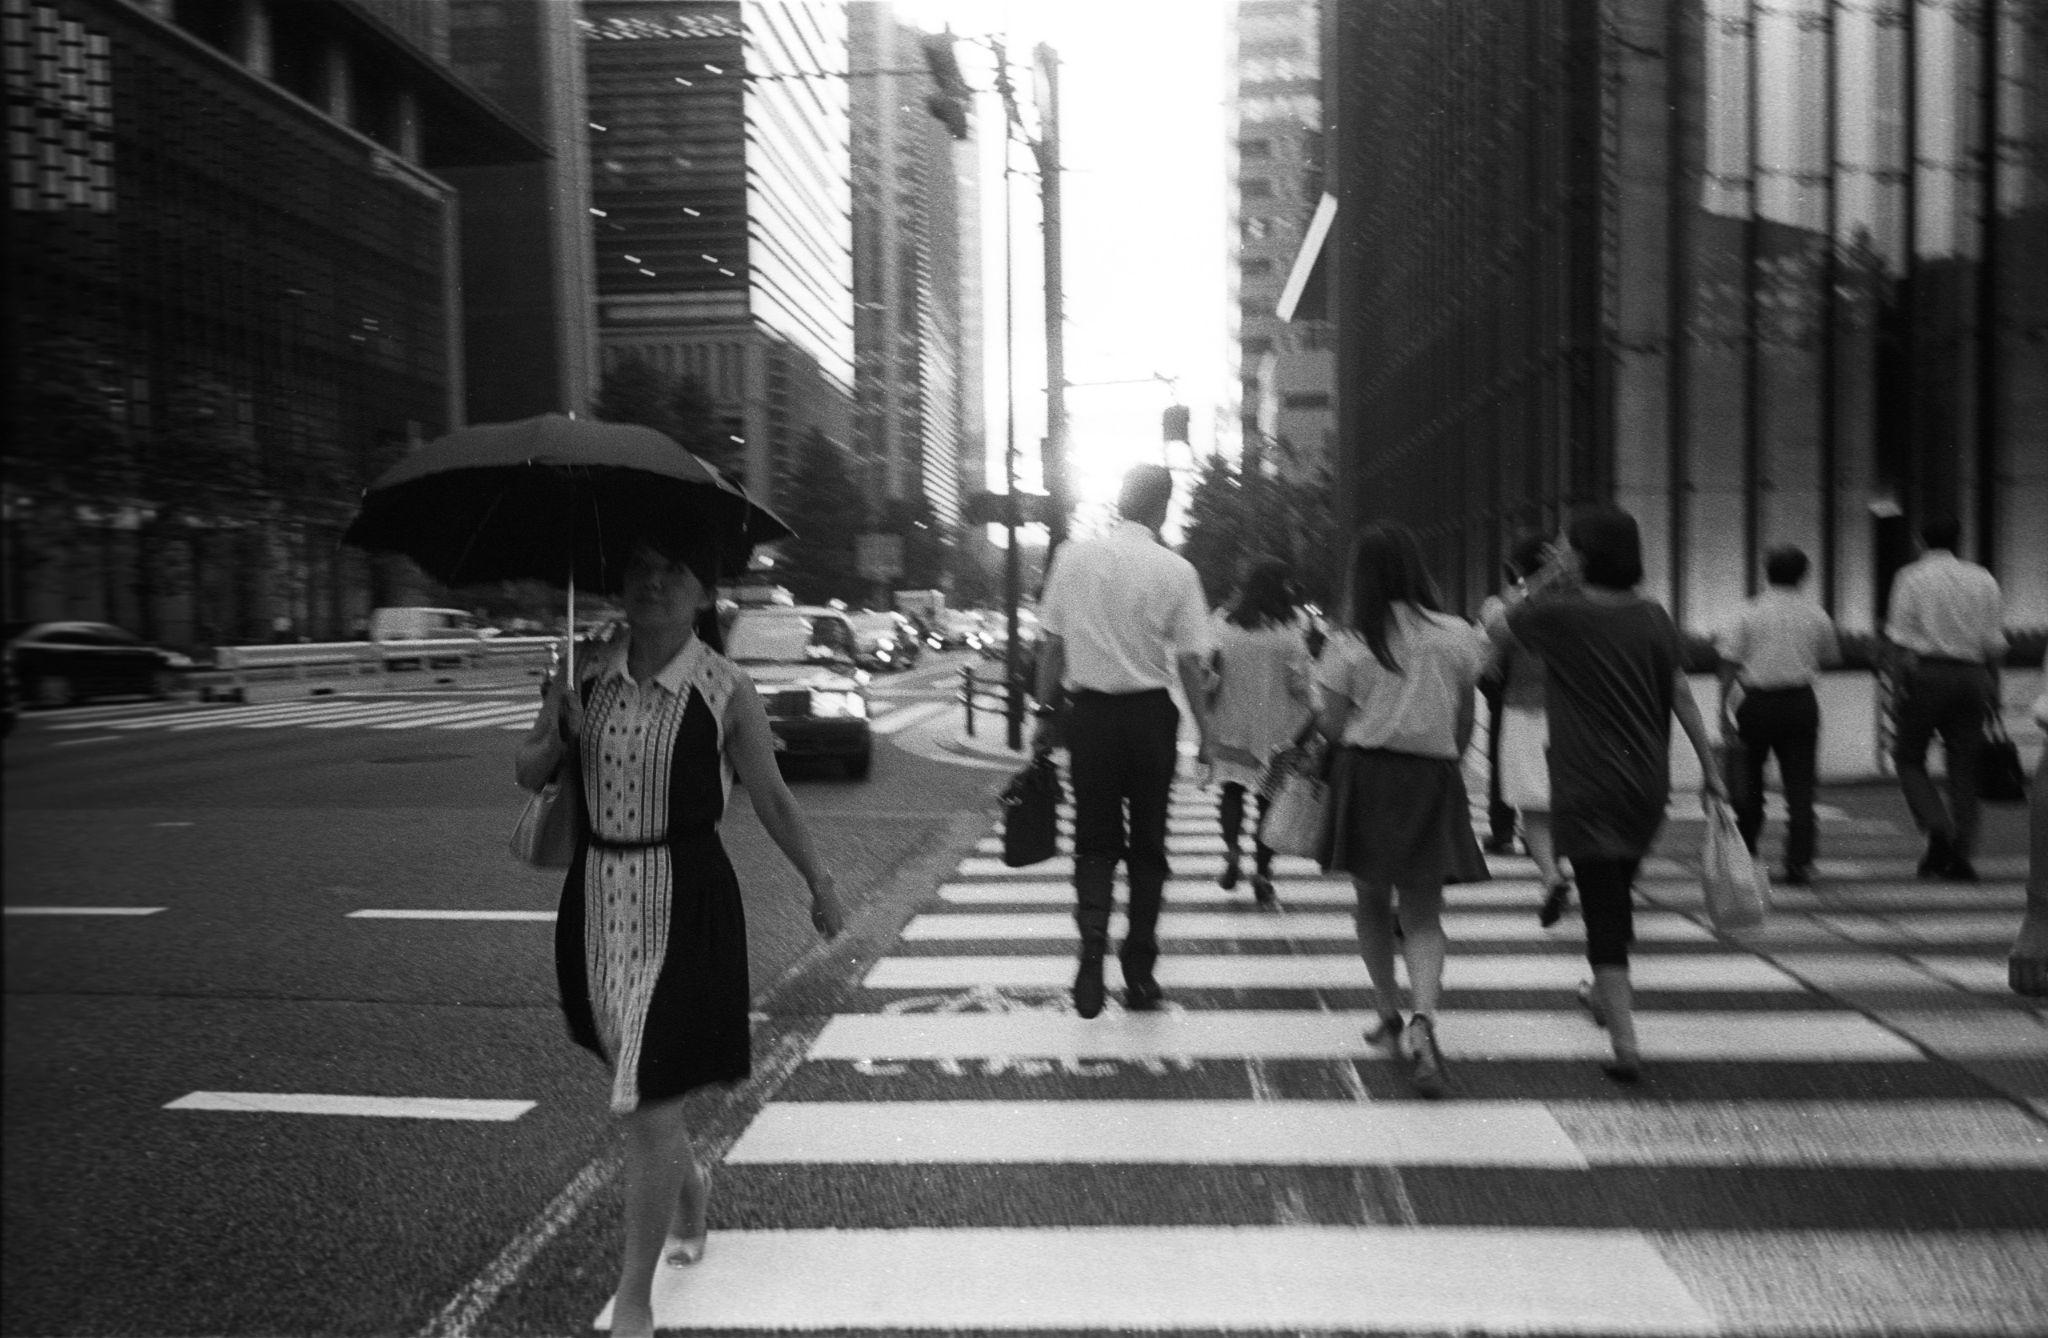 Summer days 9 by JONATHAN JONES